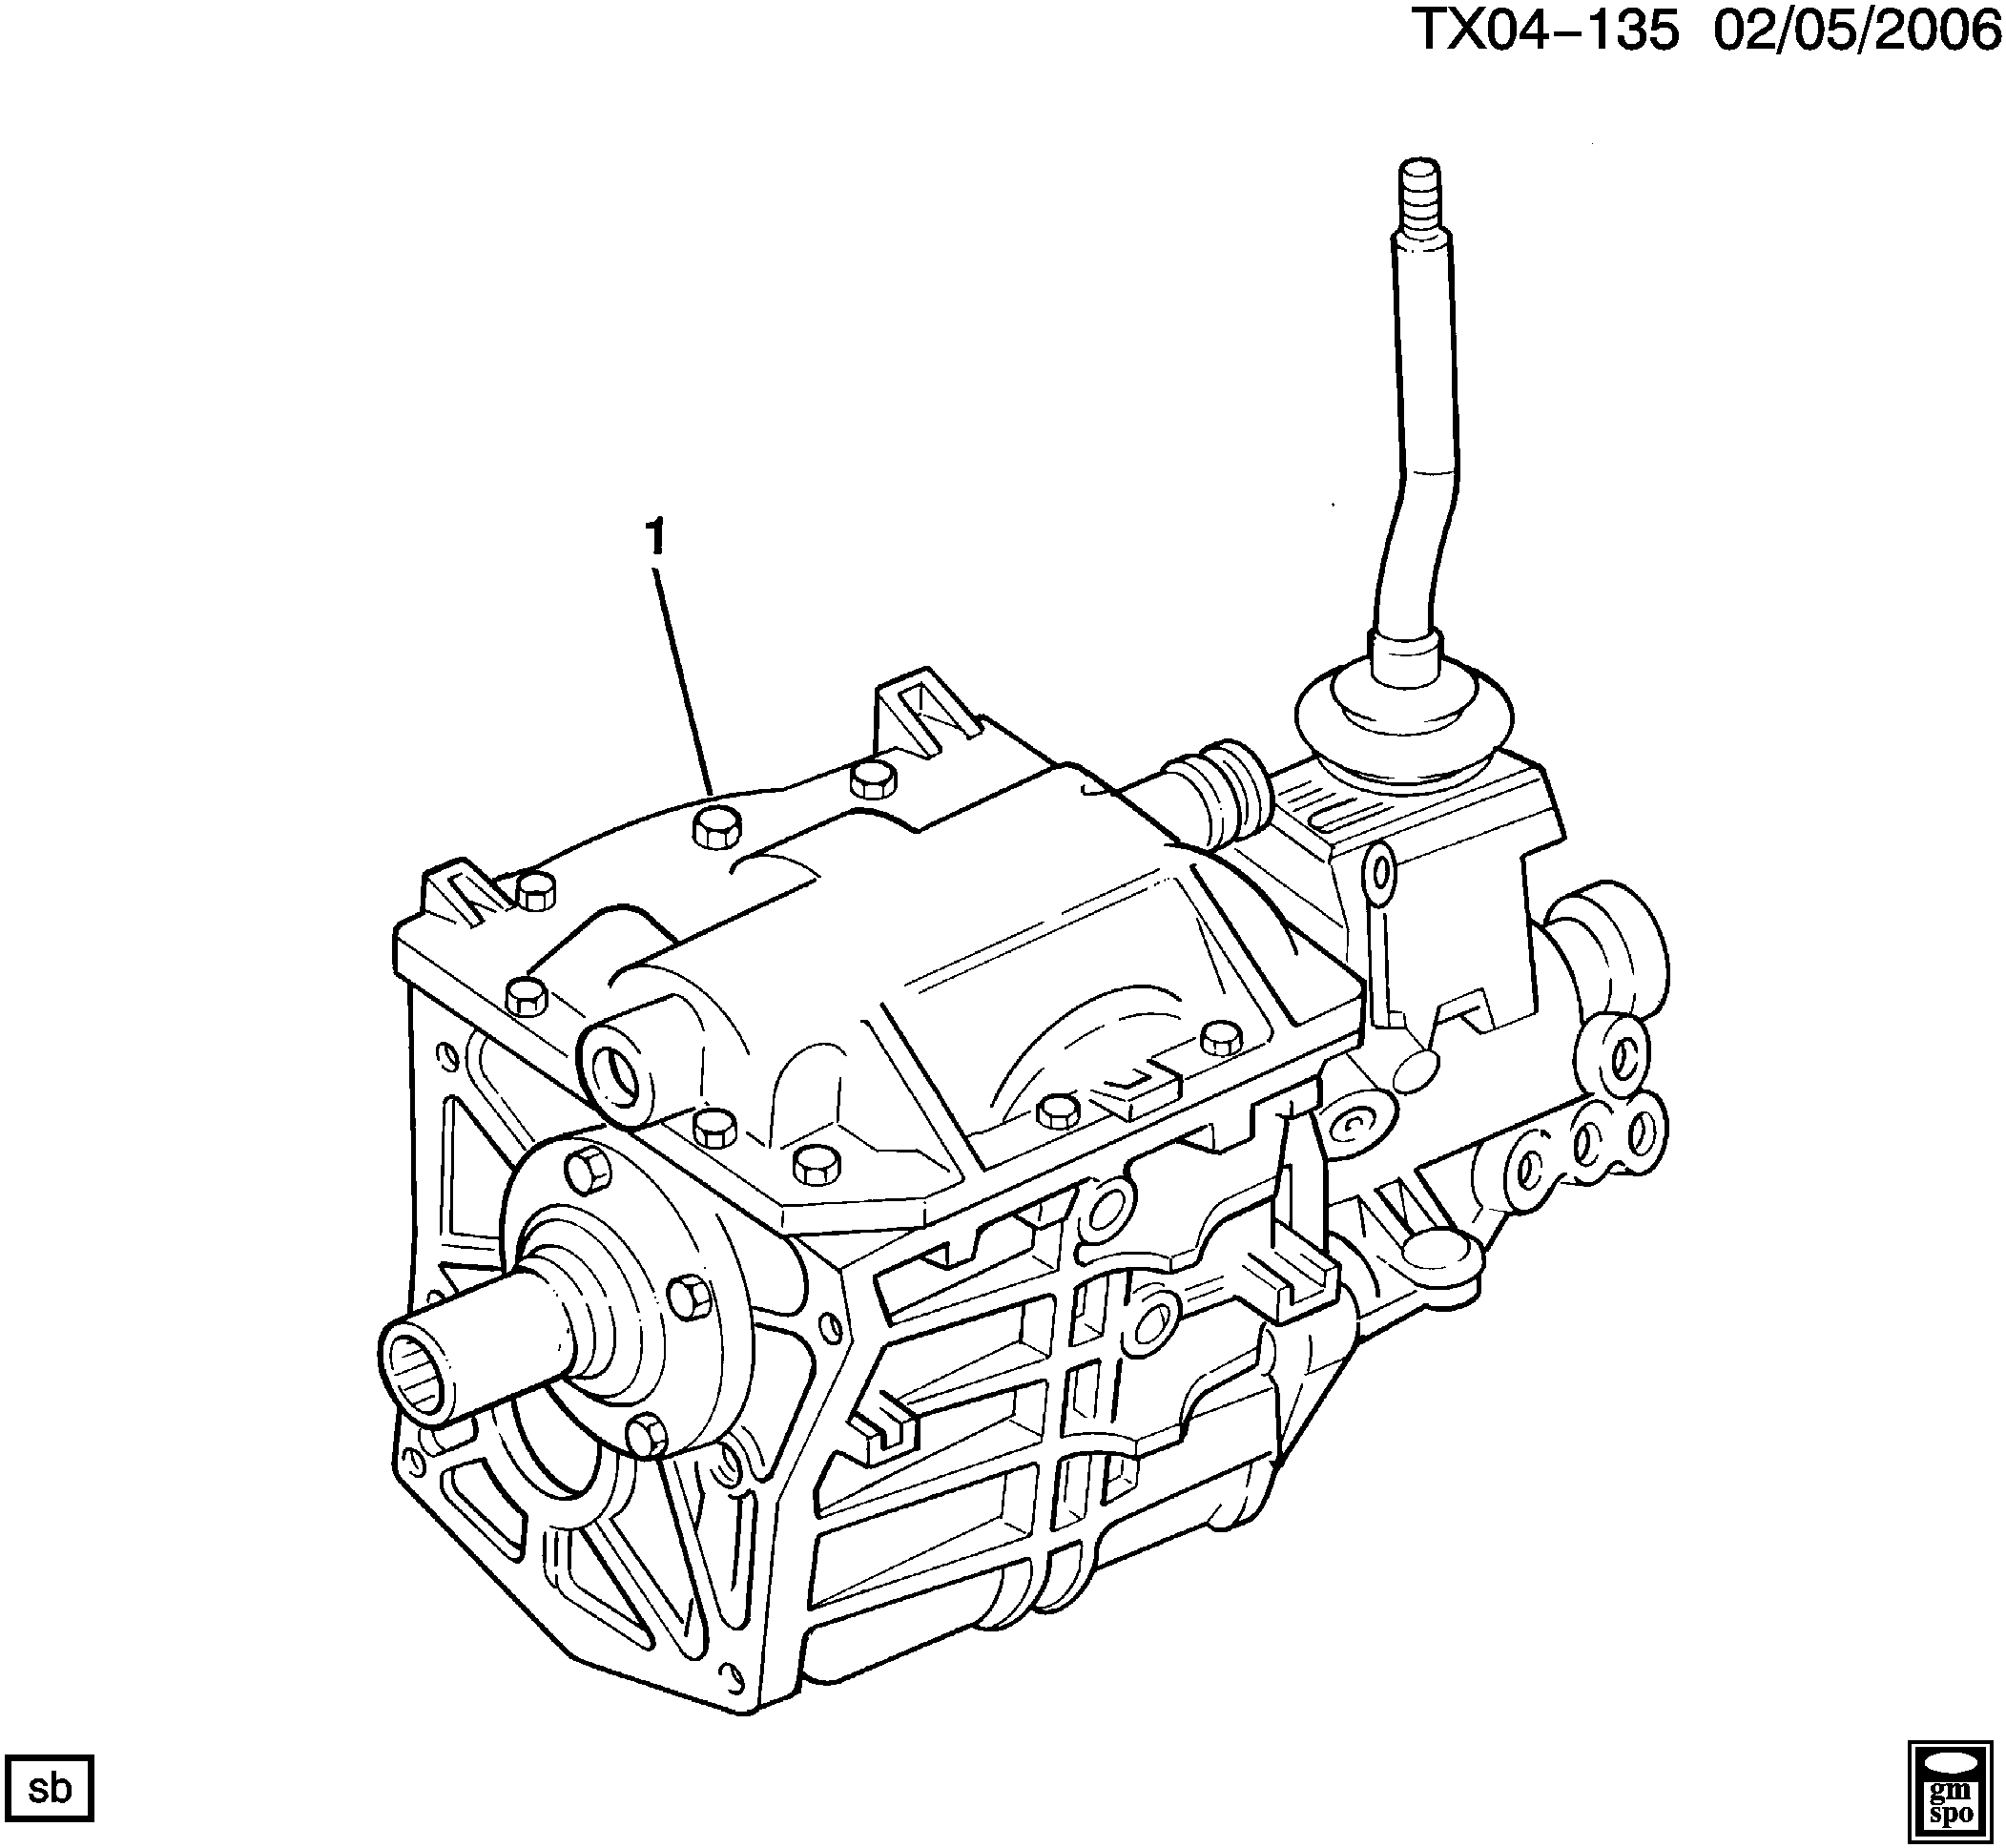 K1500 PICKUP 4WD - Carryover Model - 5-speed manual transmission